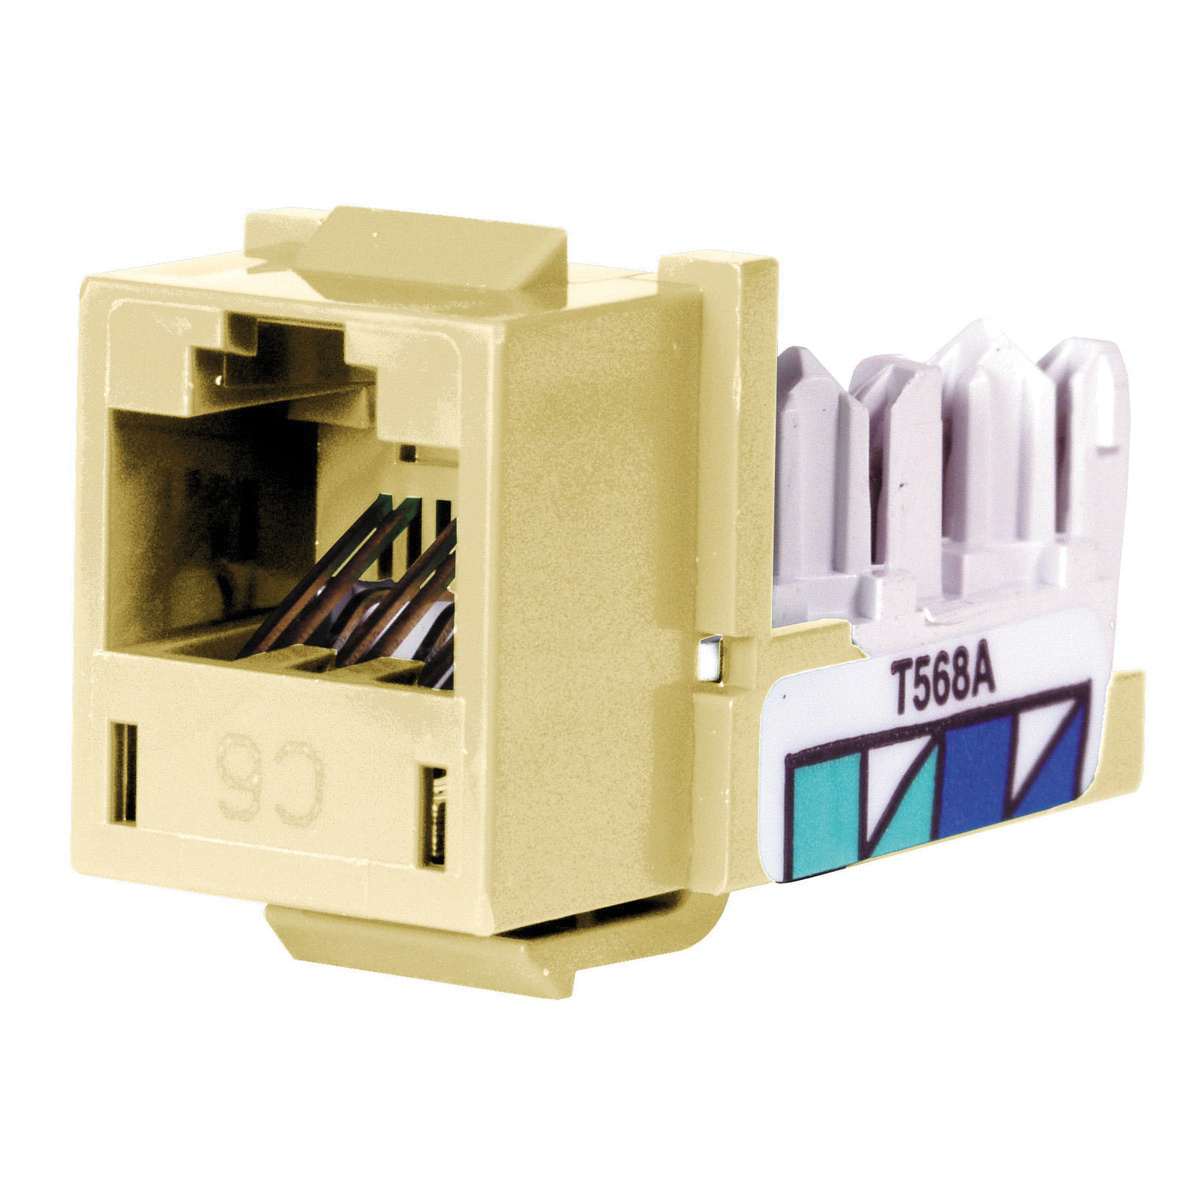 Hubbell Wiring Hxj6ei High Impact Thermoplastic 1 Port Xcelerator Data Jack Telephone Electric